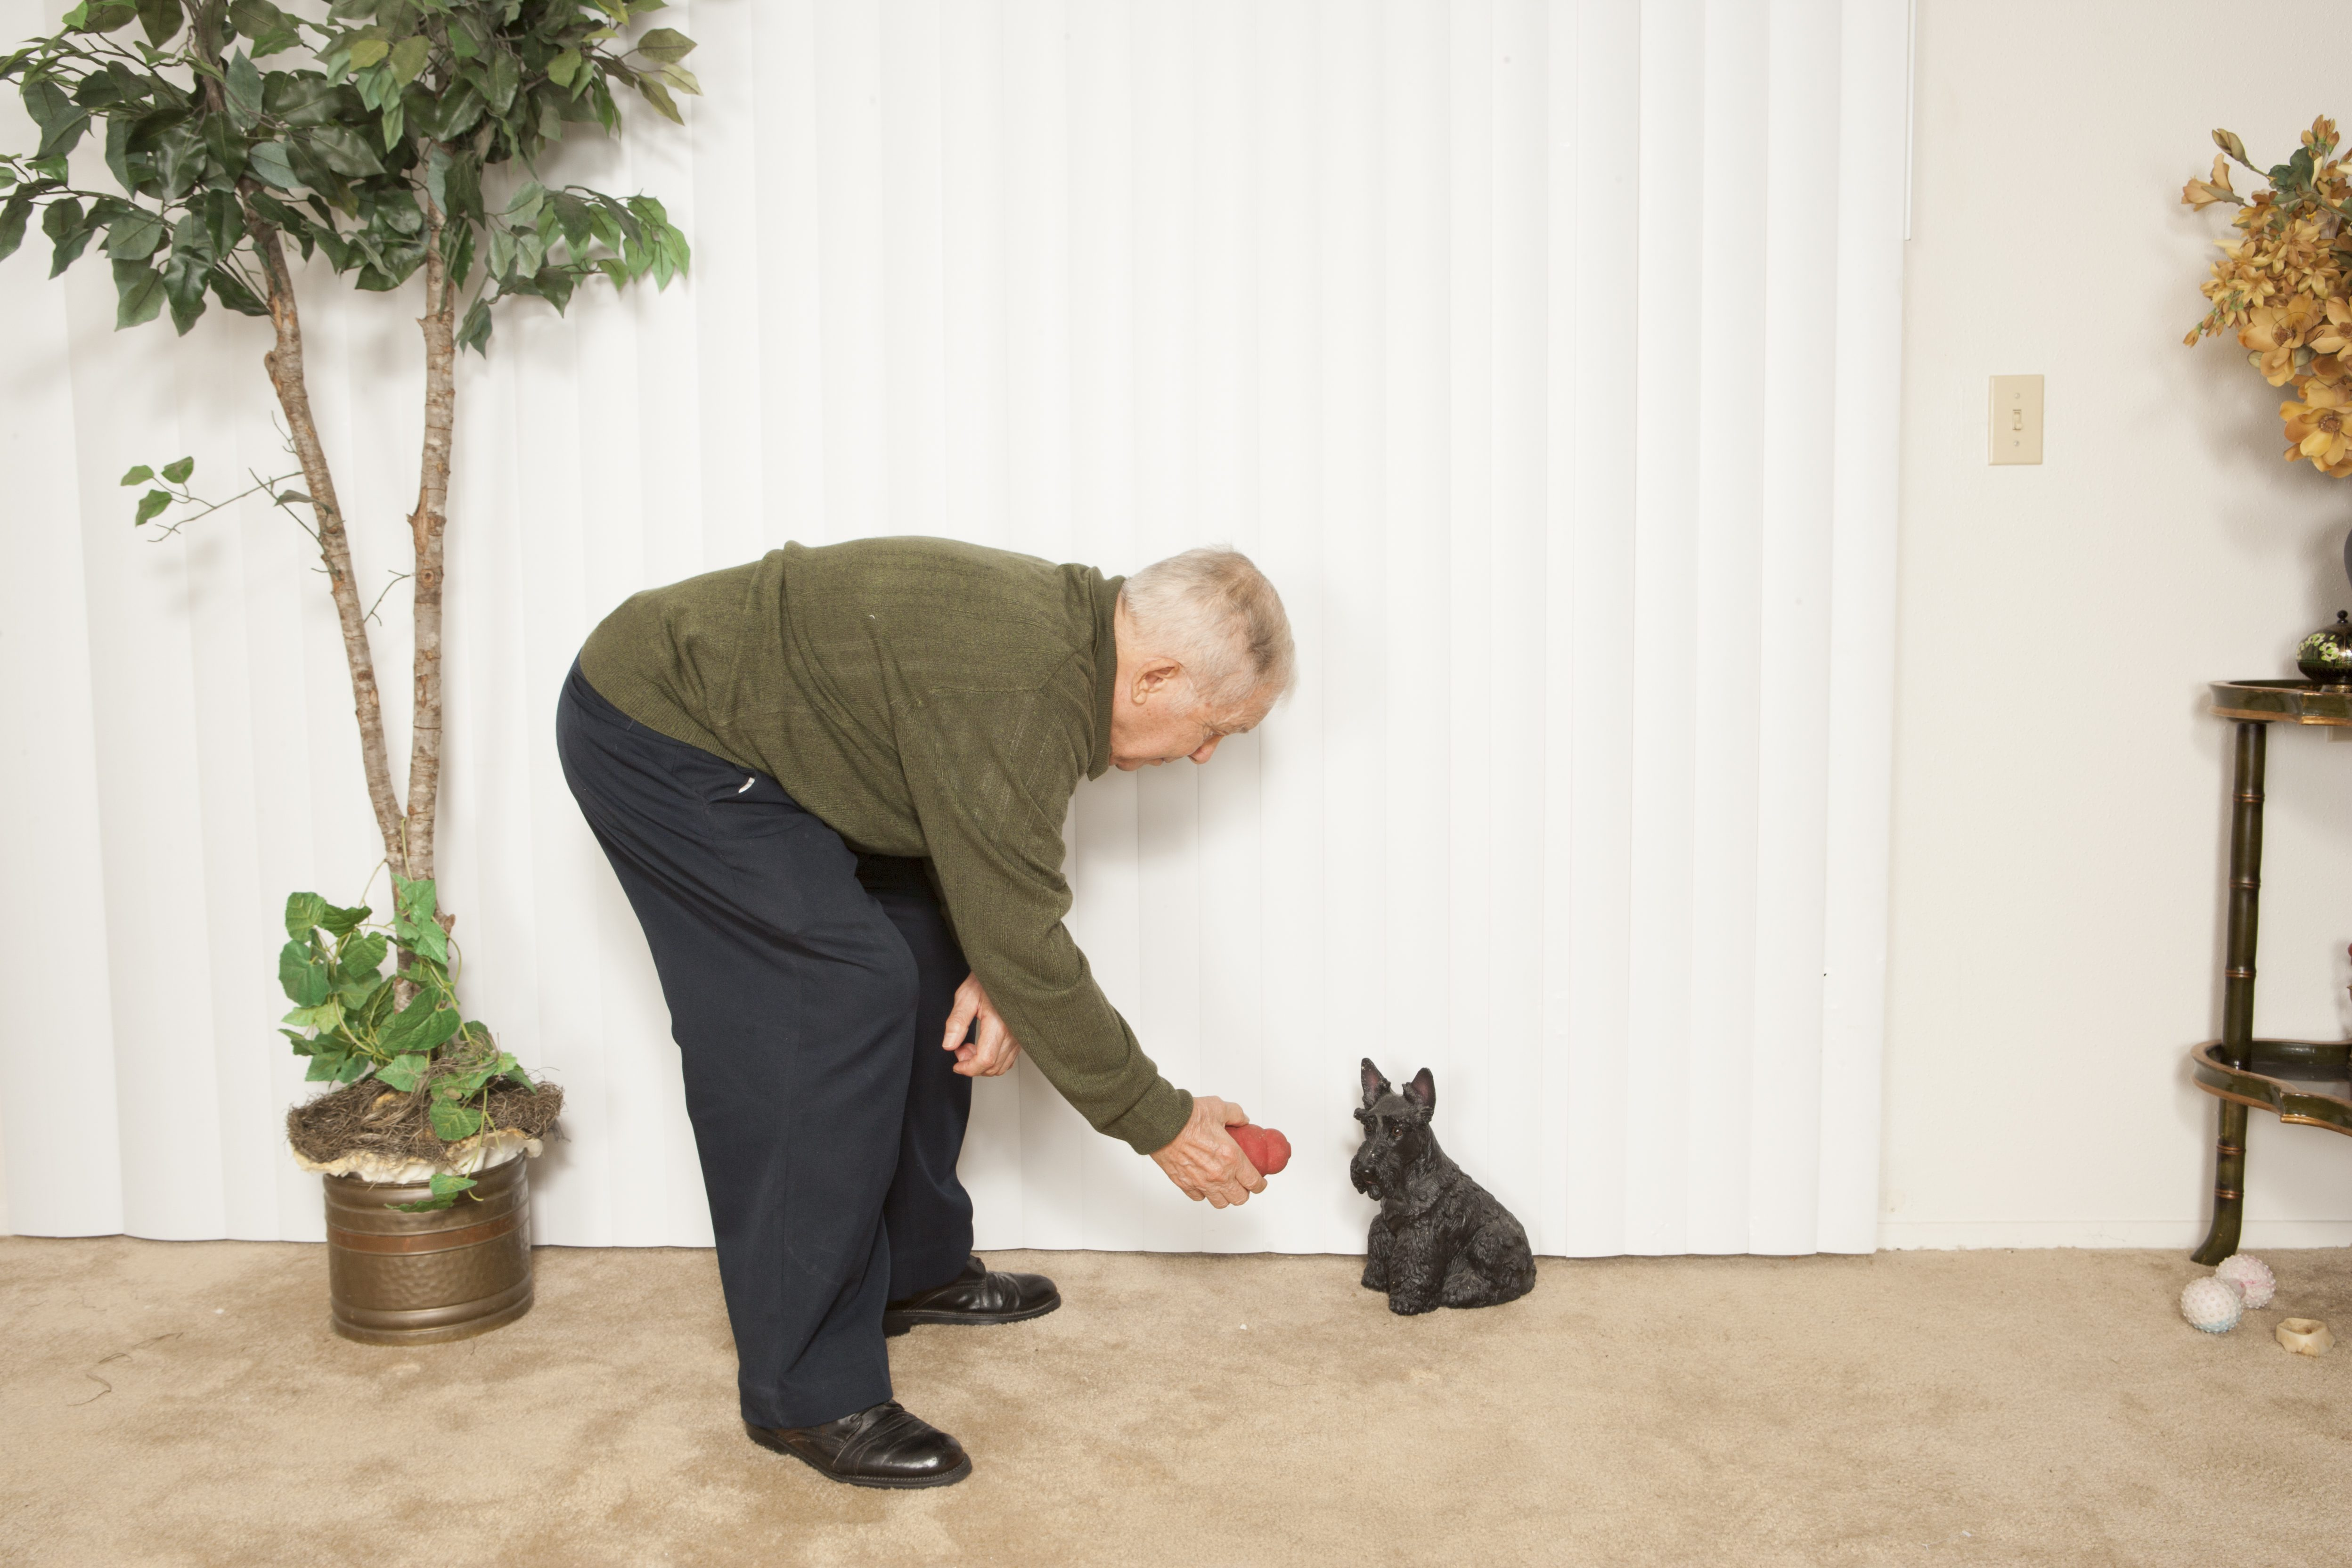 Senior man instructing pet